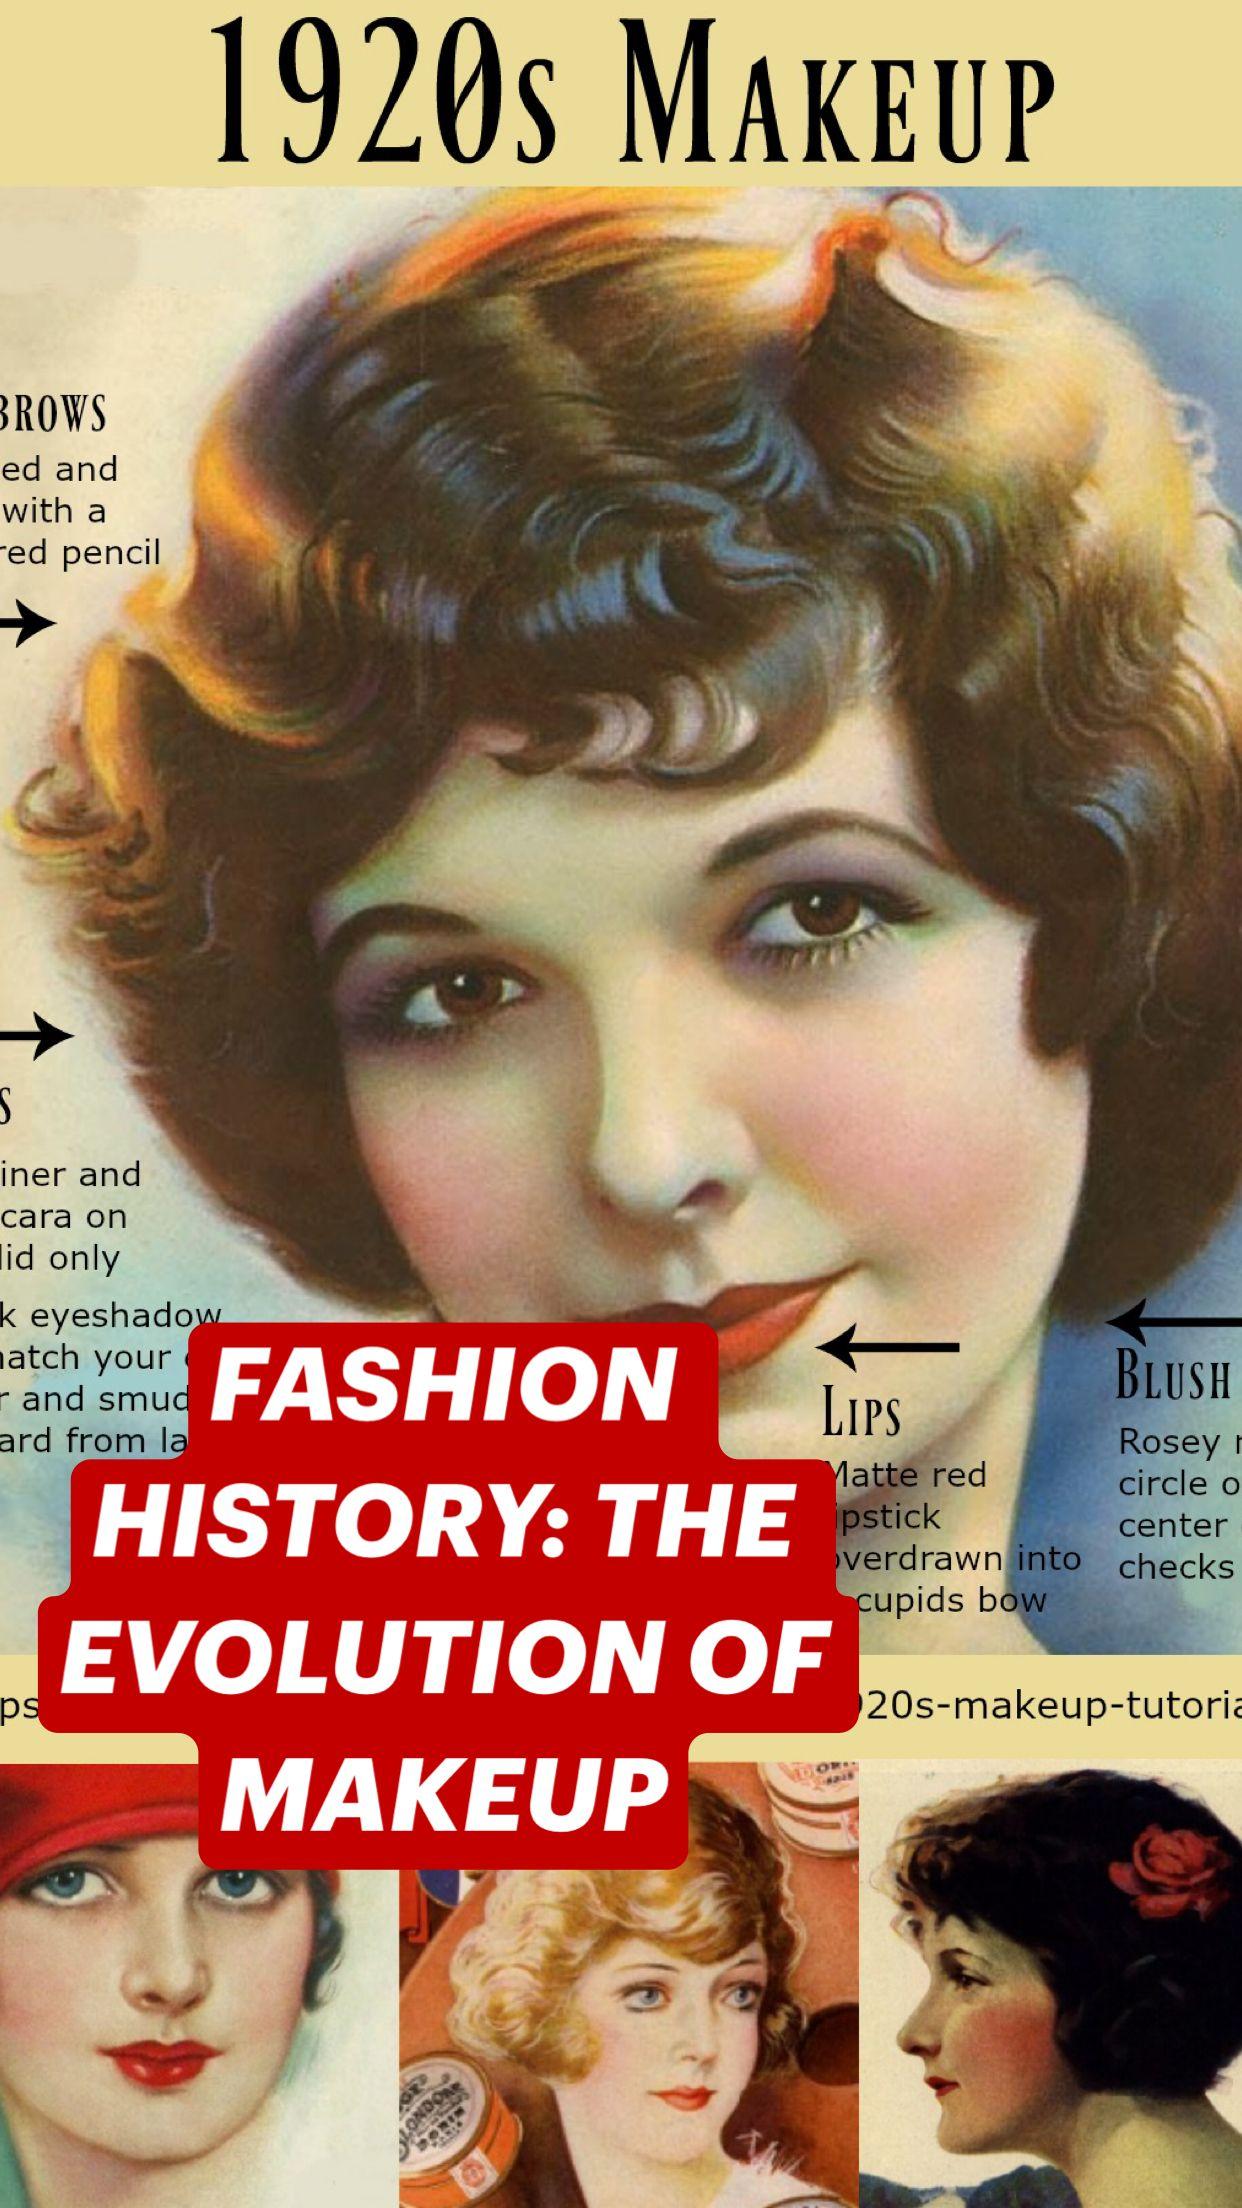 FASHION HISTORY: THE EVOLUTION OF MAKEUP